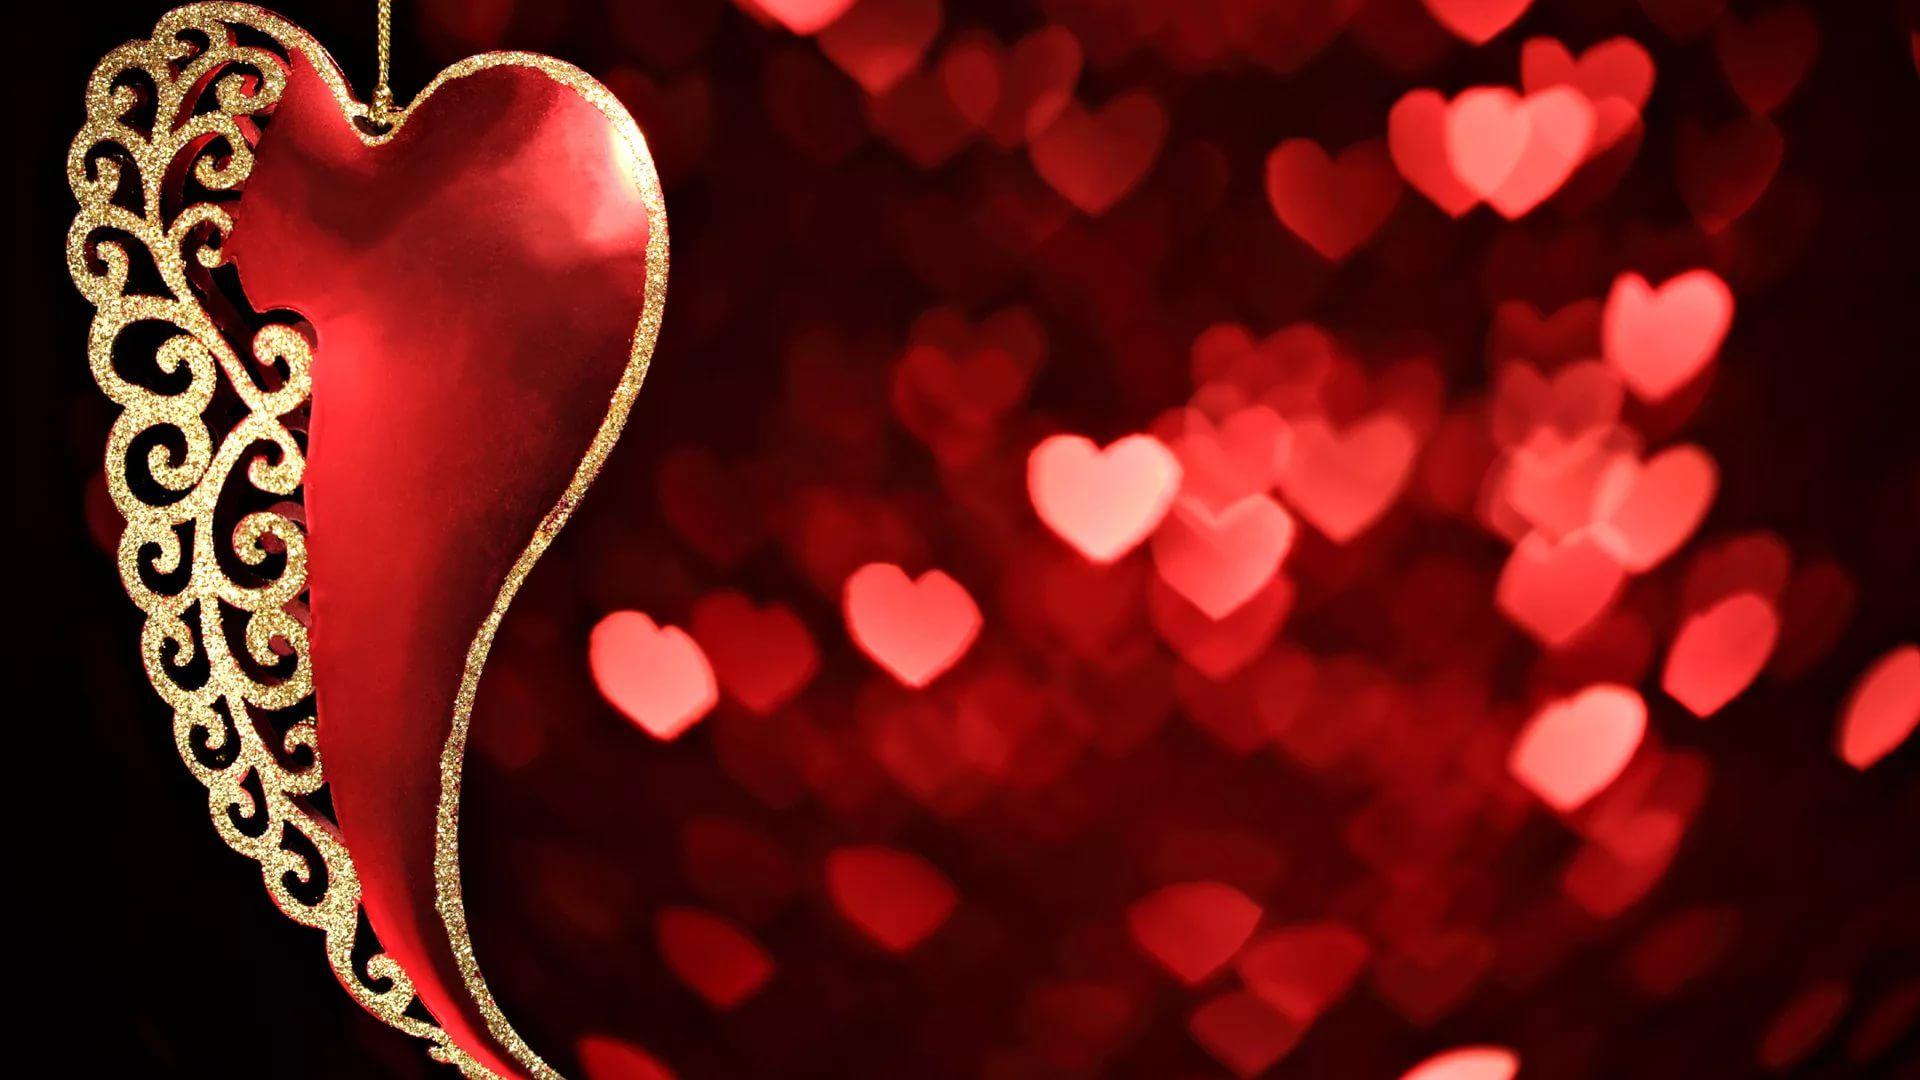 Valentine Screensaver hd wallpaper for laptop